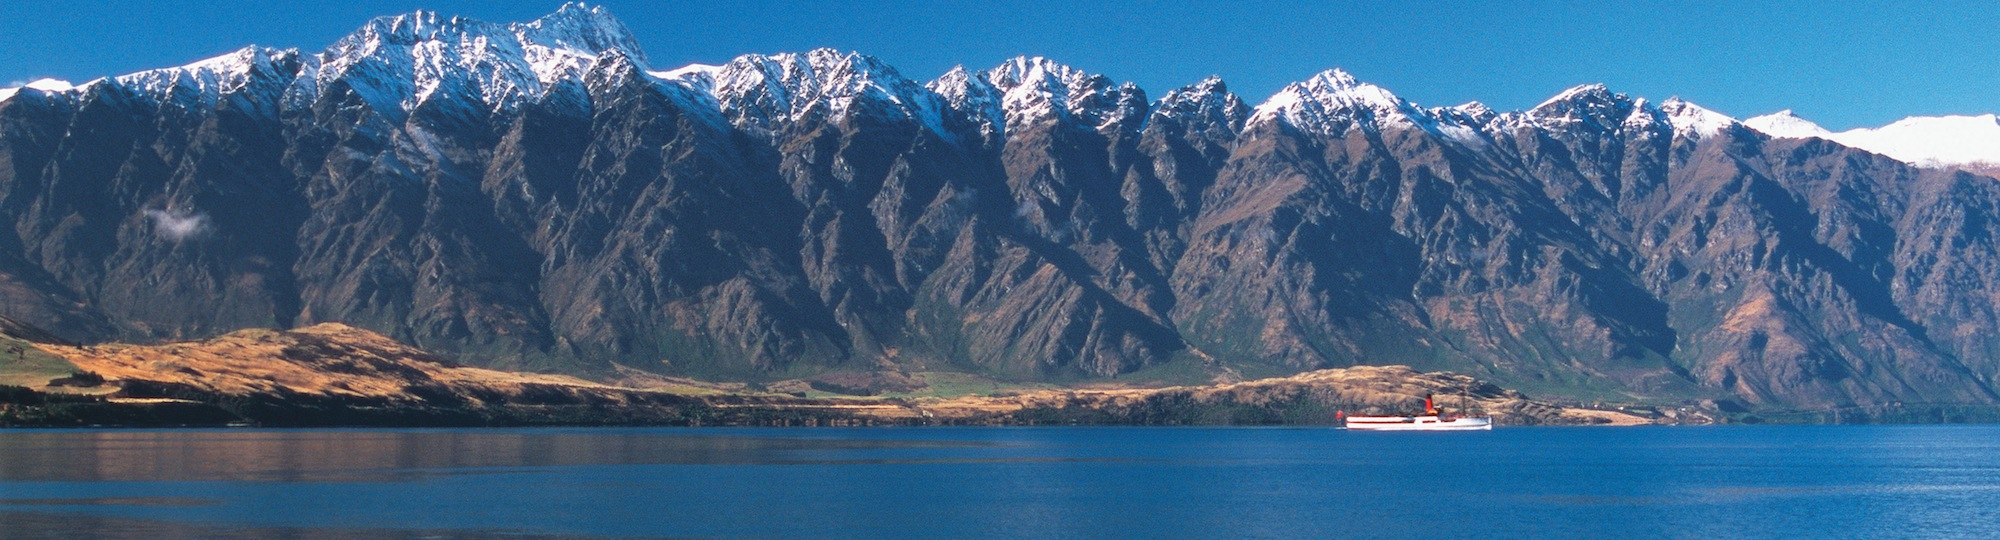 England in New Zeland